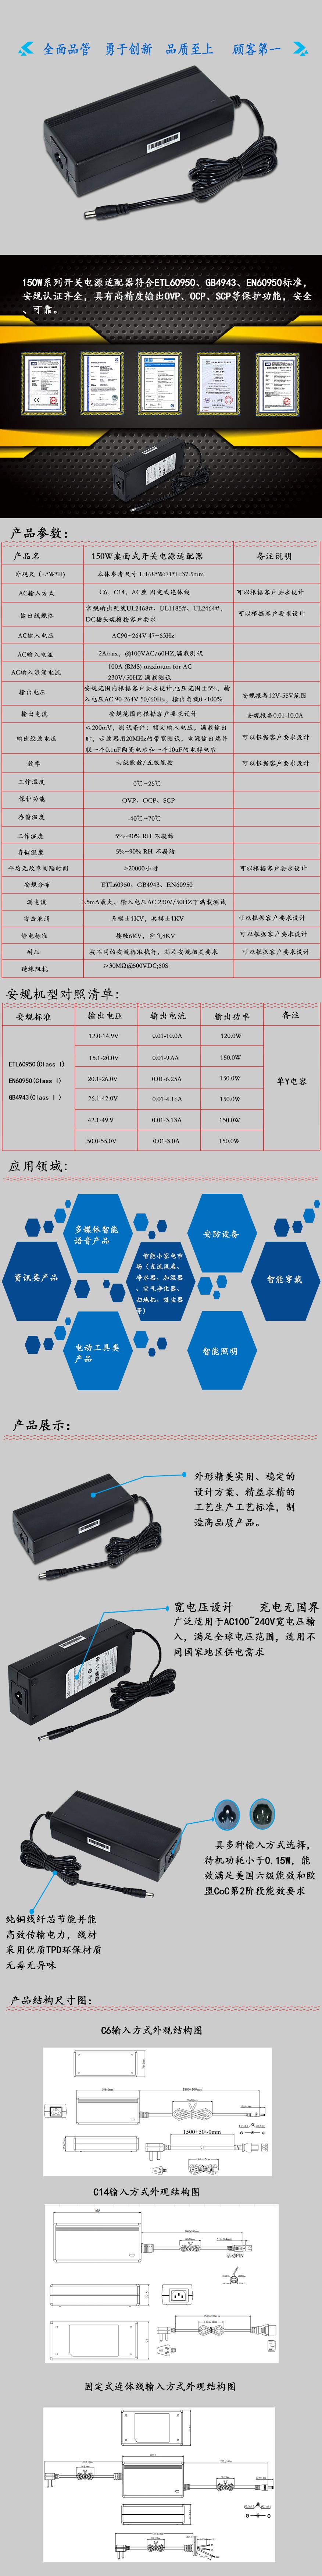 150w中文